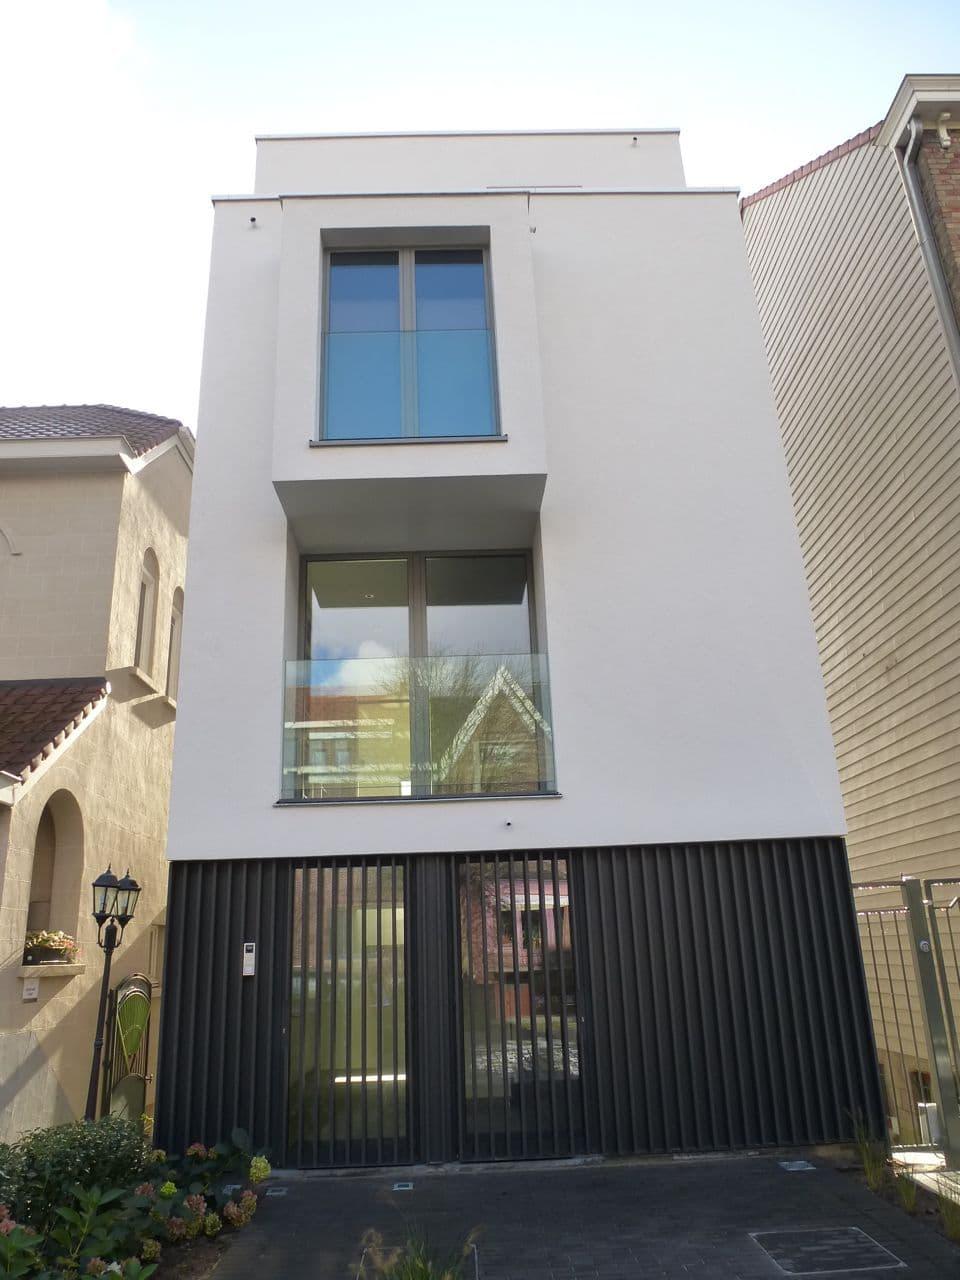 P1080712 | Baeyens & Beck architecten Gent | architect nieuwbouw renovatie interieur | high end | architectenbureau